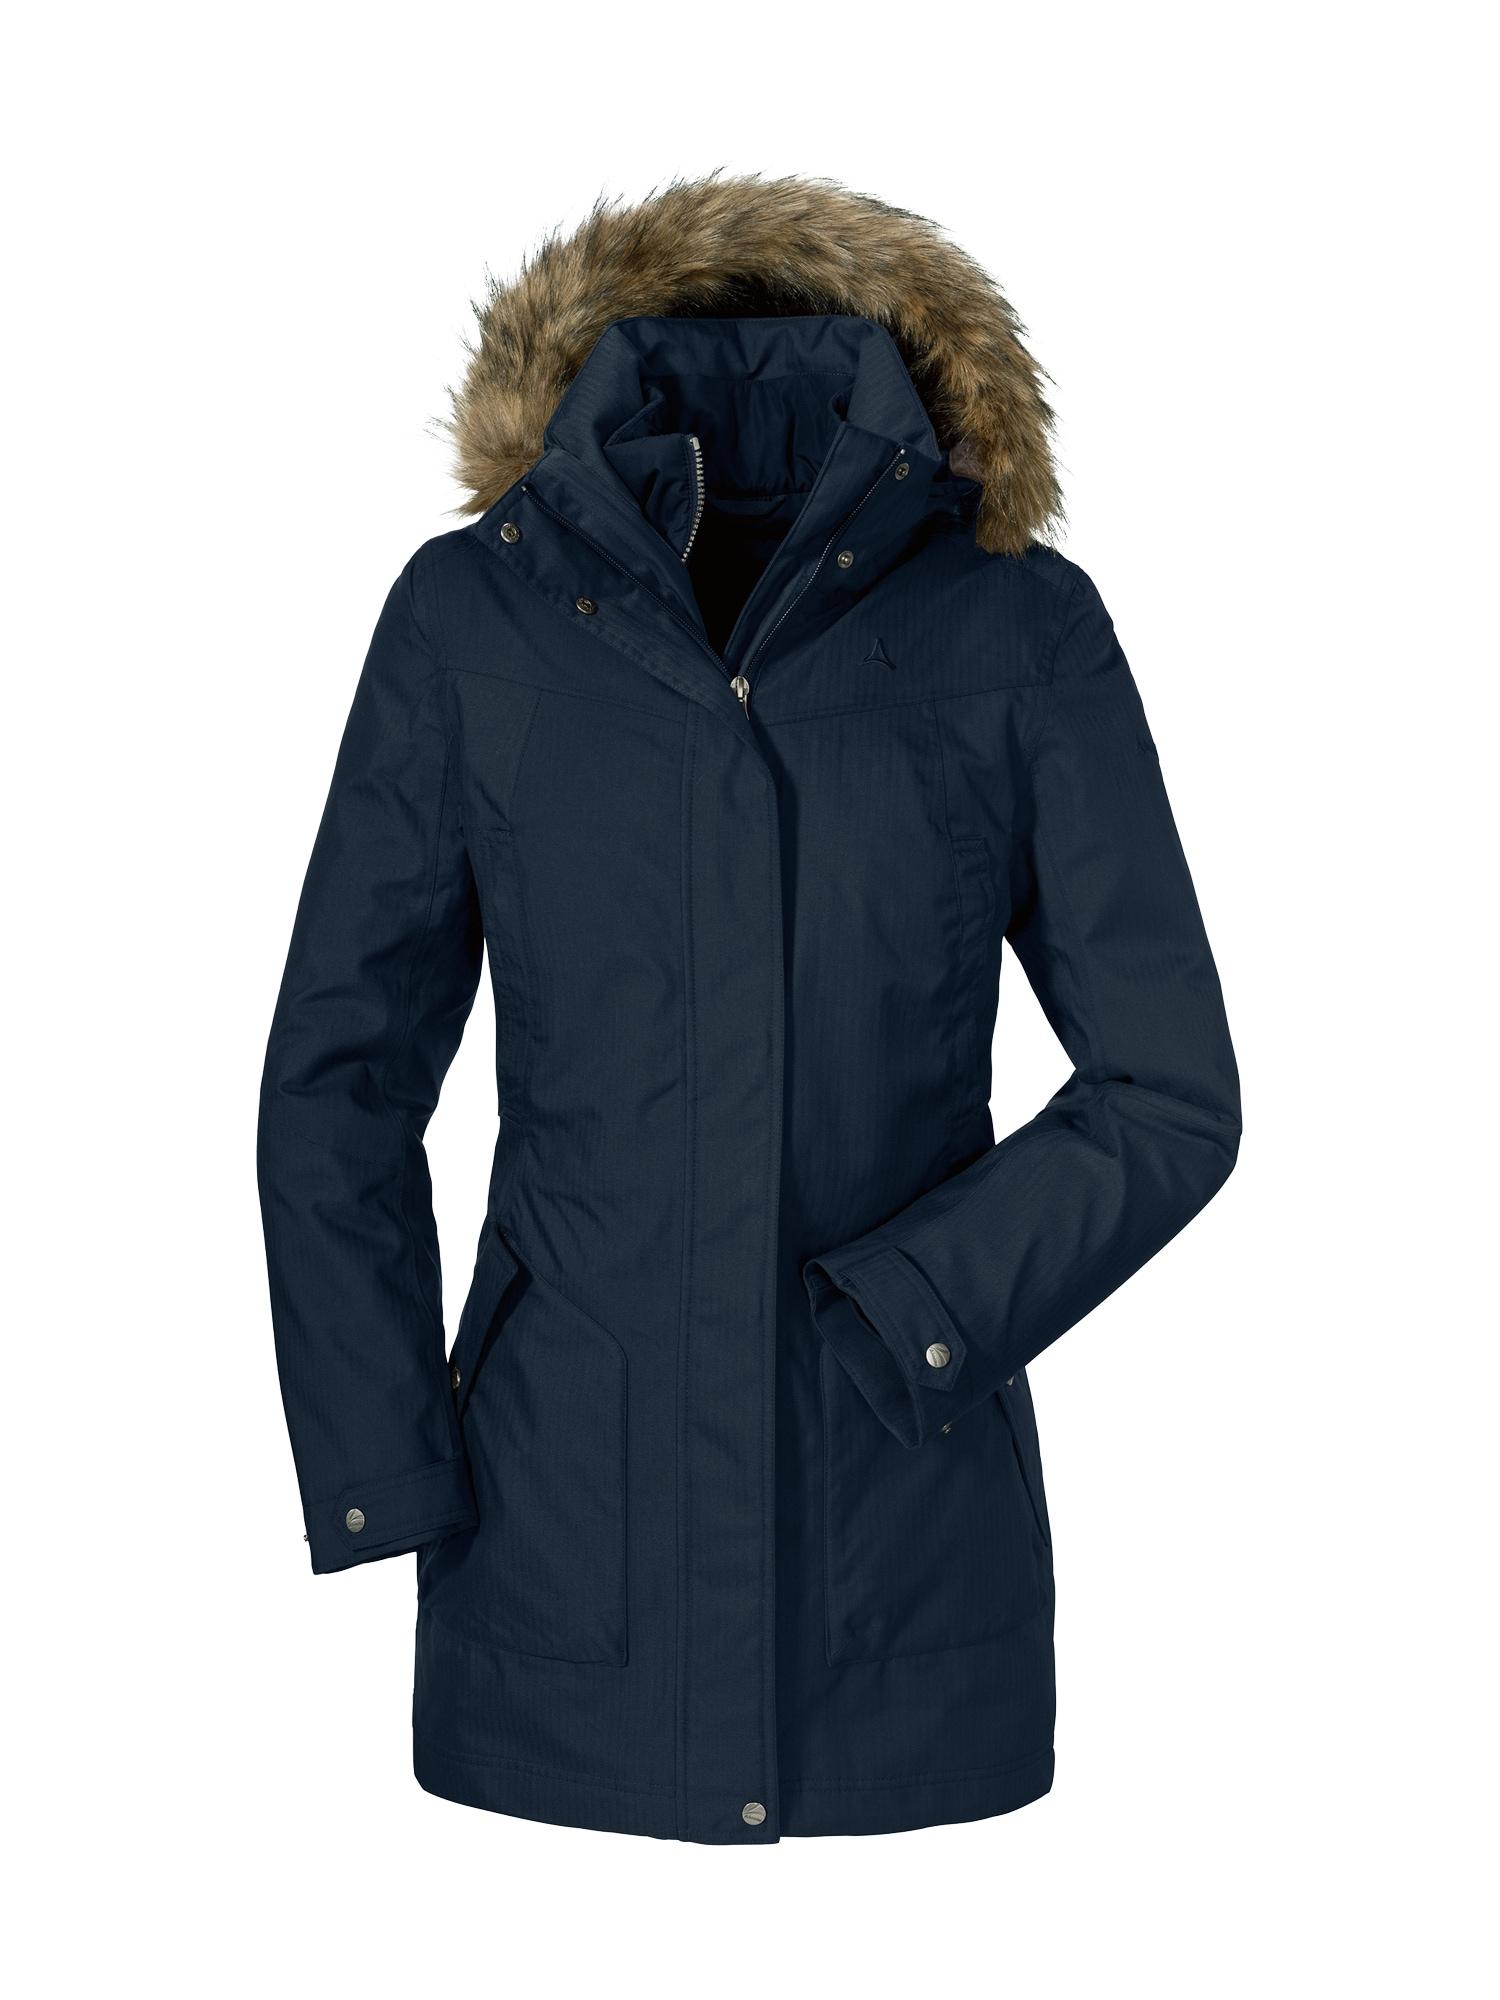 Outdoorový kabát 3in1 Jacket Genova2 tmavě modrá Schöffel